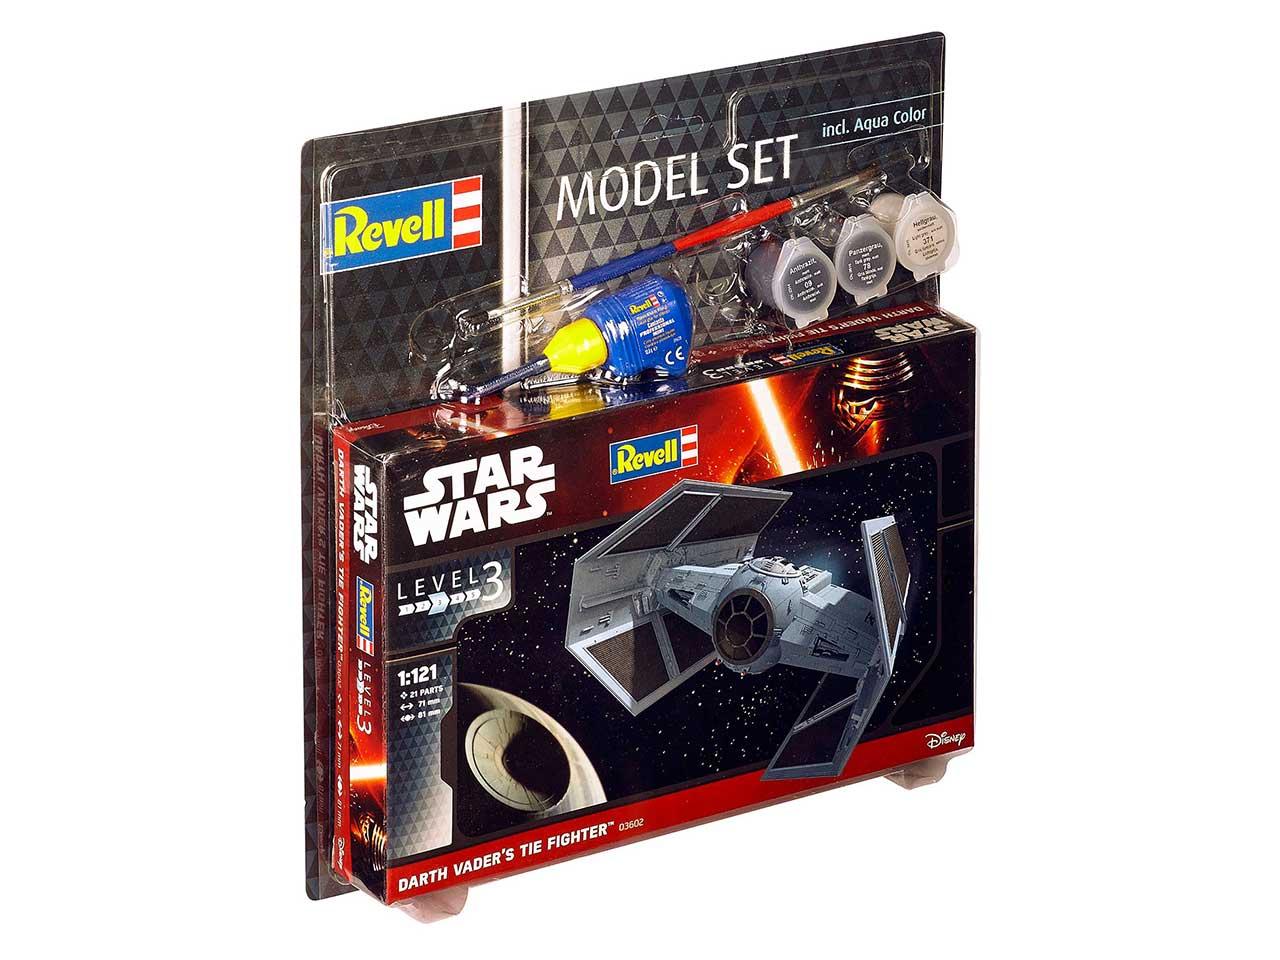 1:121 Darth Vader's TIE Fighter, Star Wars (Model Set)